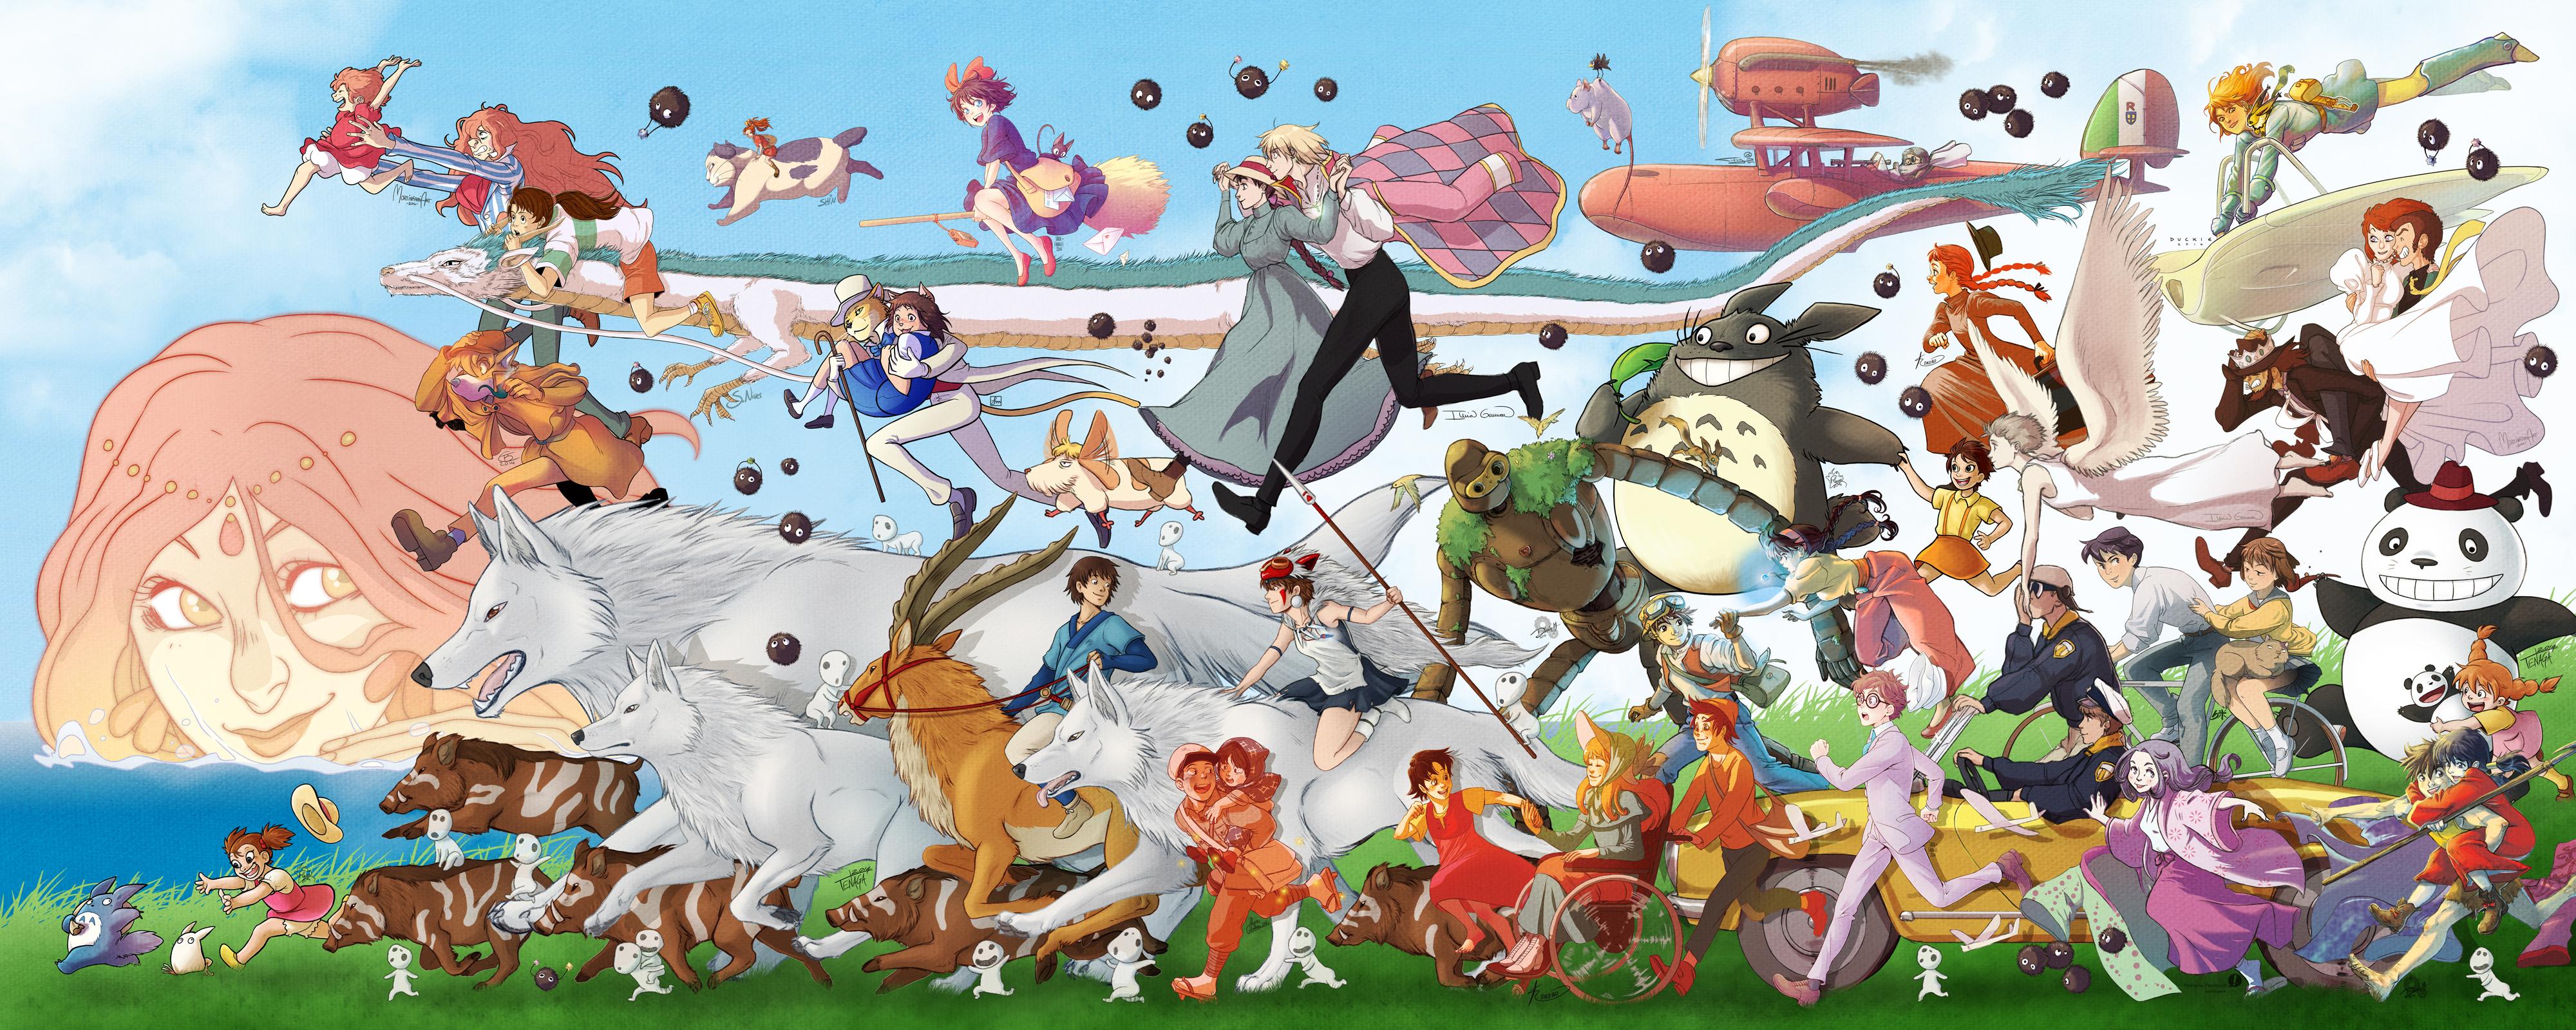 Ghibli parade by Tenaga 4000x1600